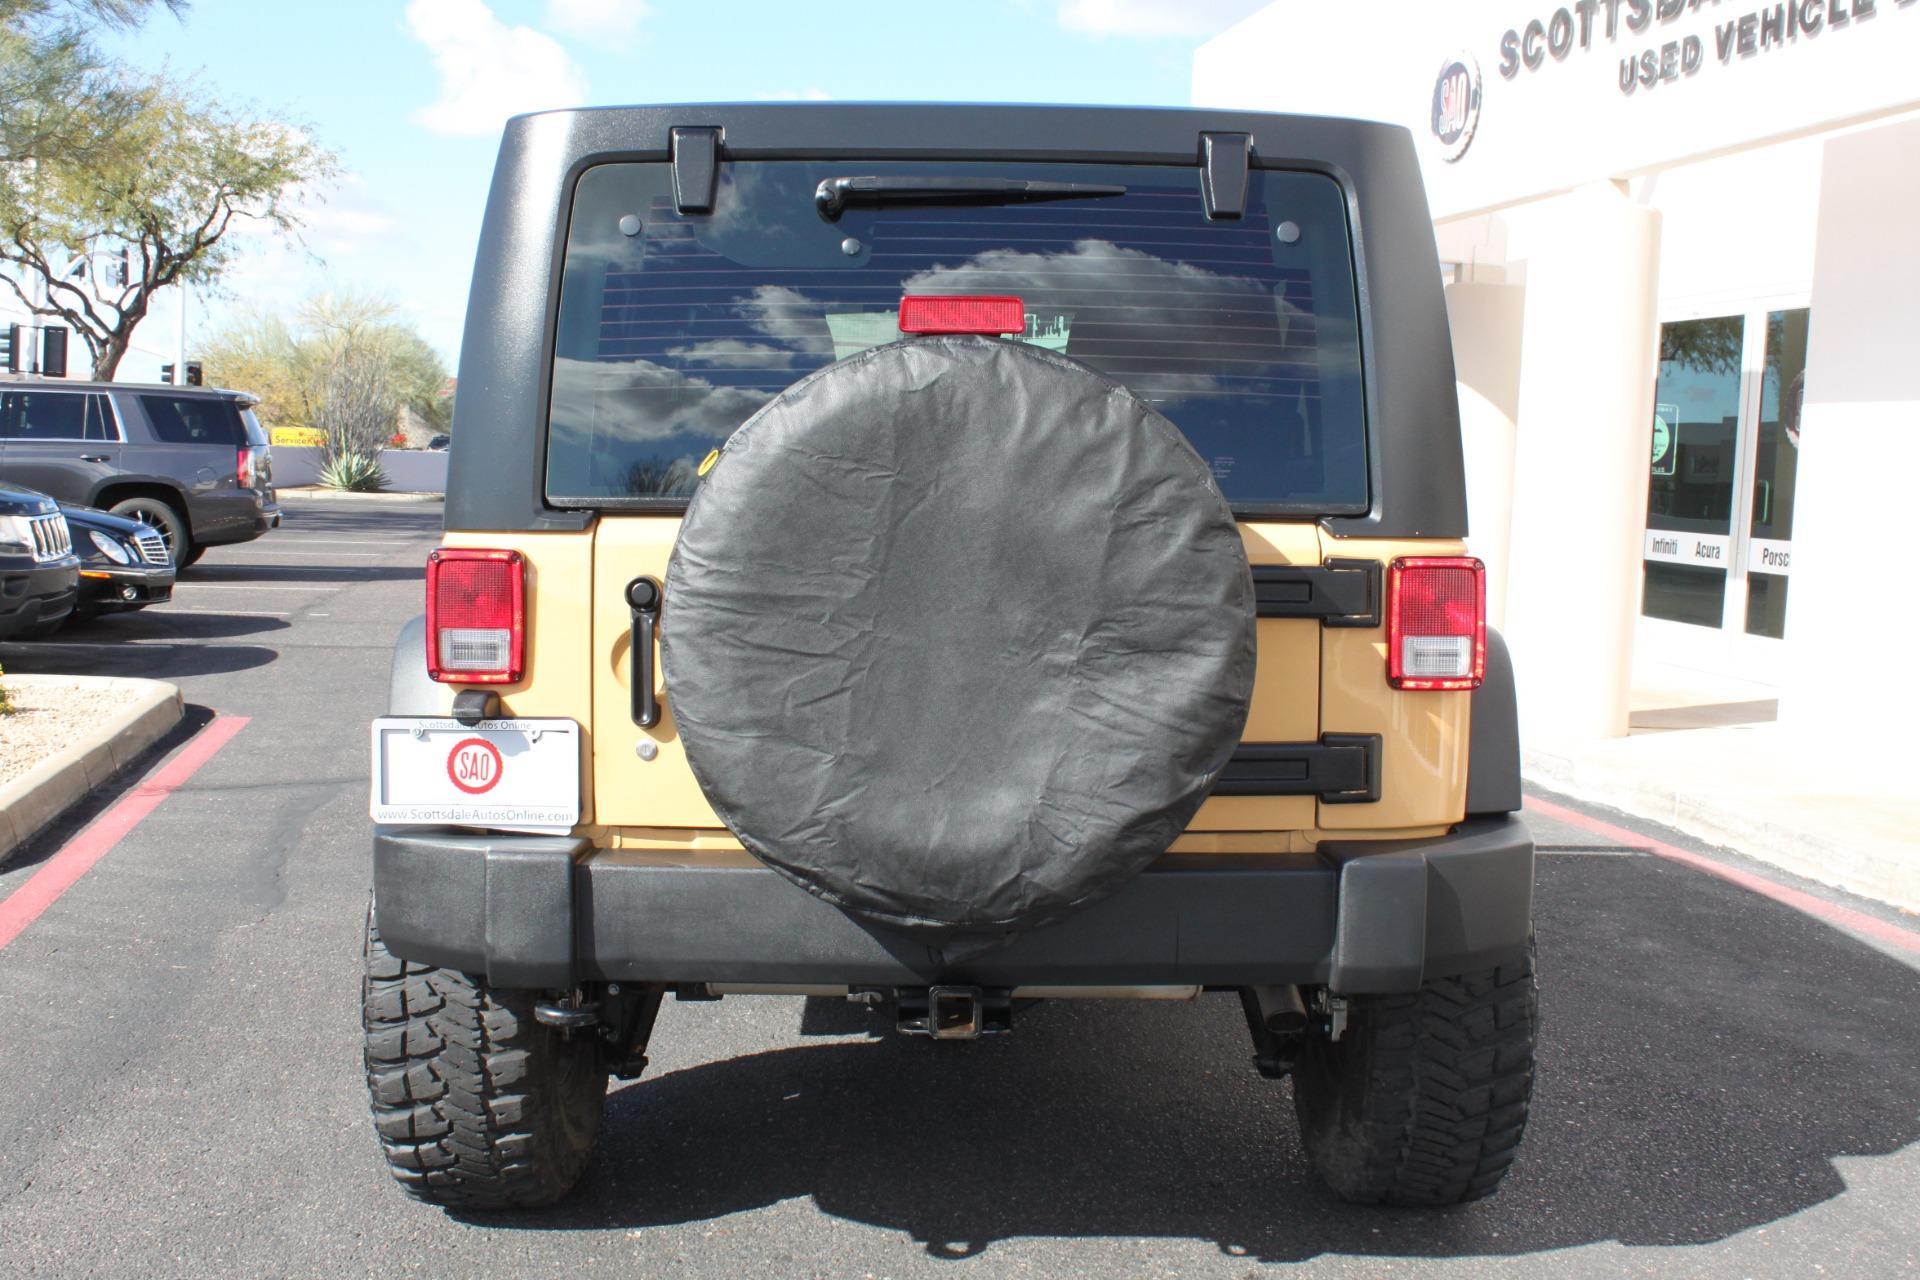 Used-2013-Jeep-Wrangler-Unlimited-Sport-4X4-Mopar